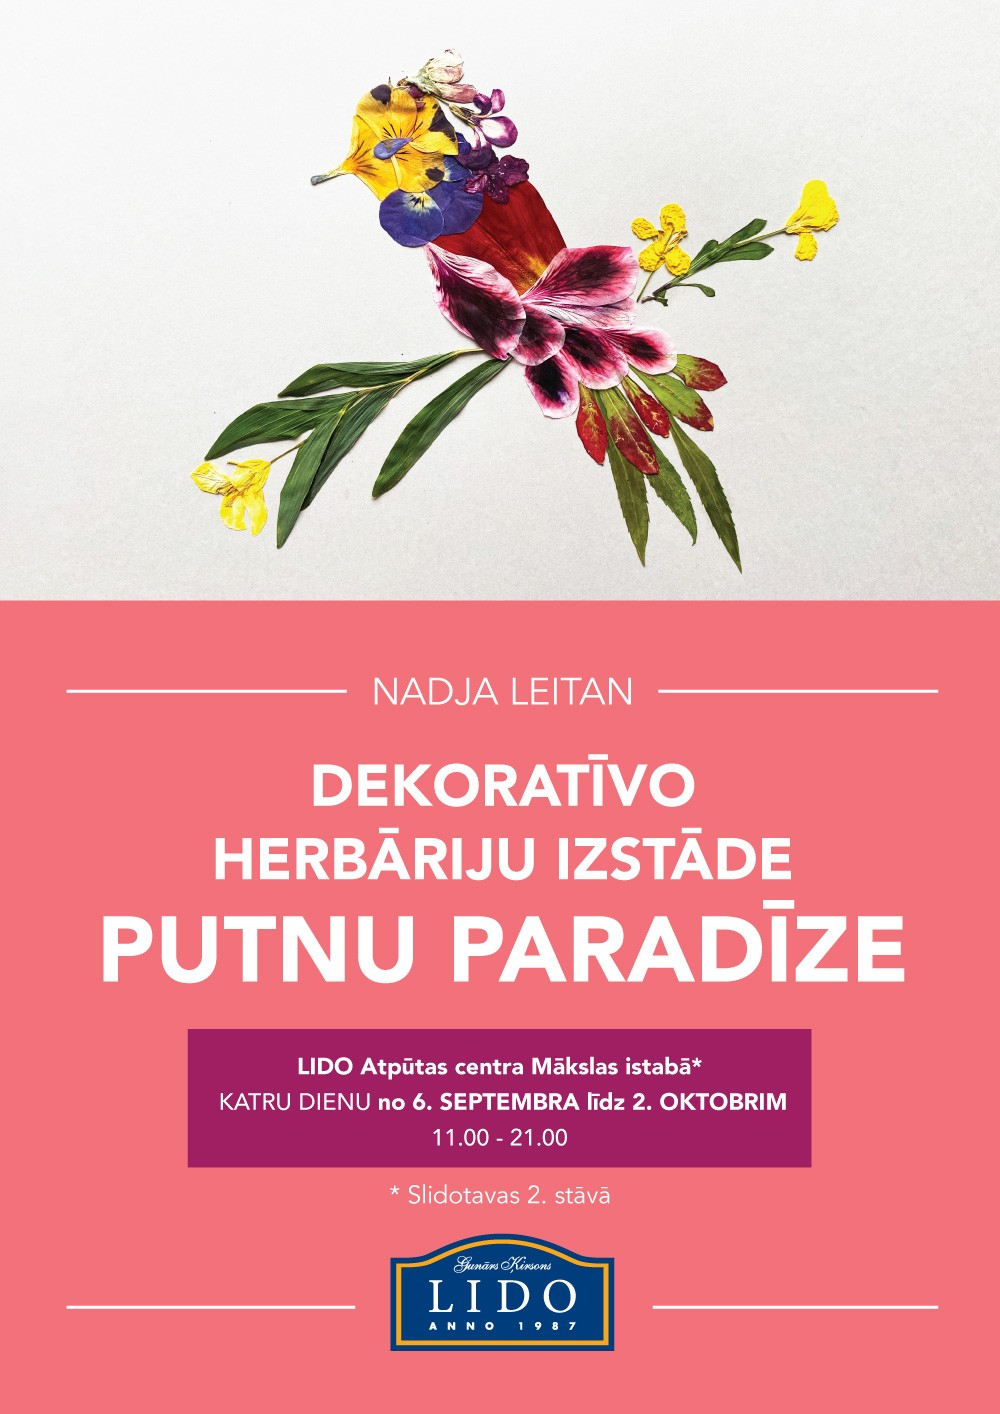 PutnuParadize-Plakats-A4-09.2020-3.jpg